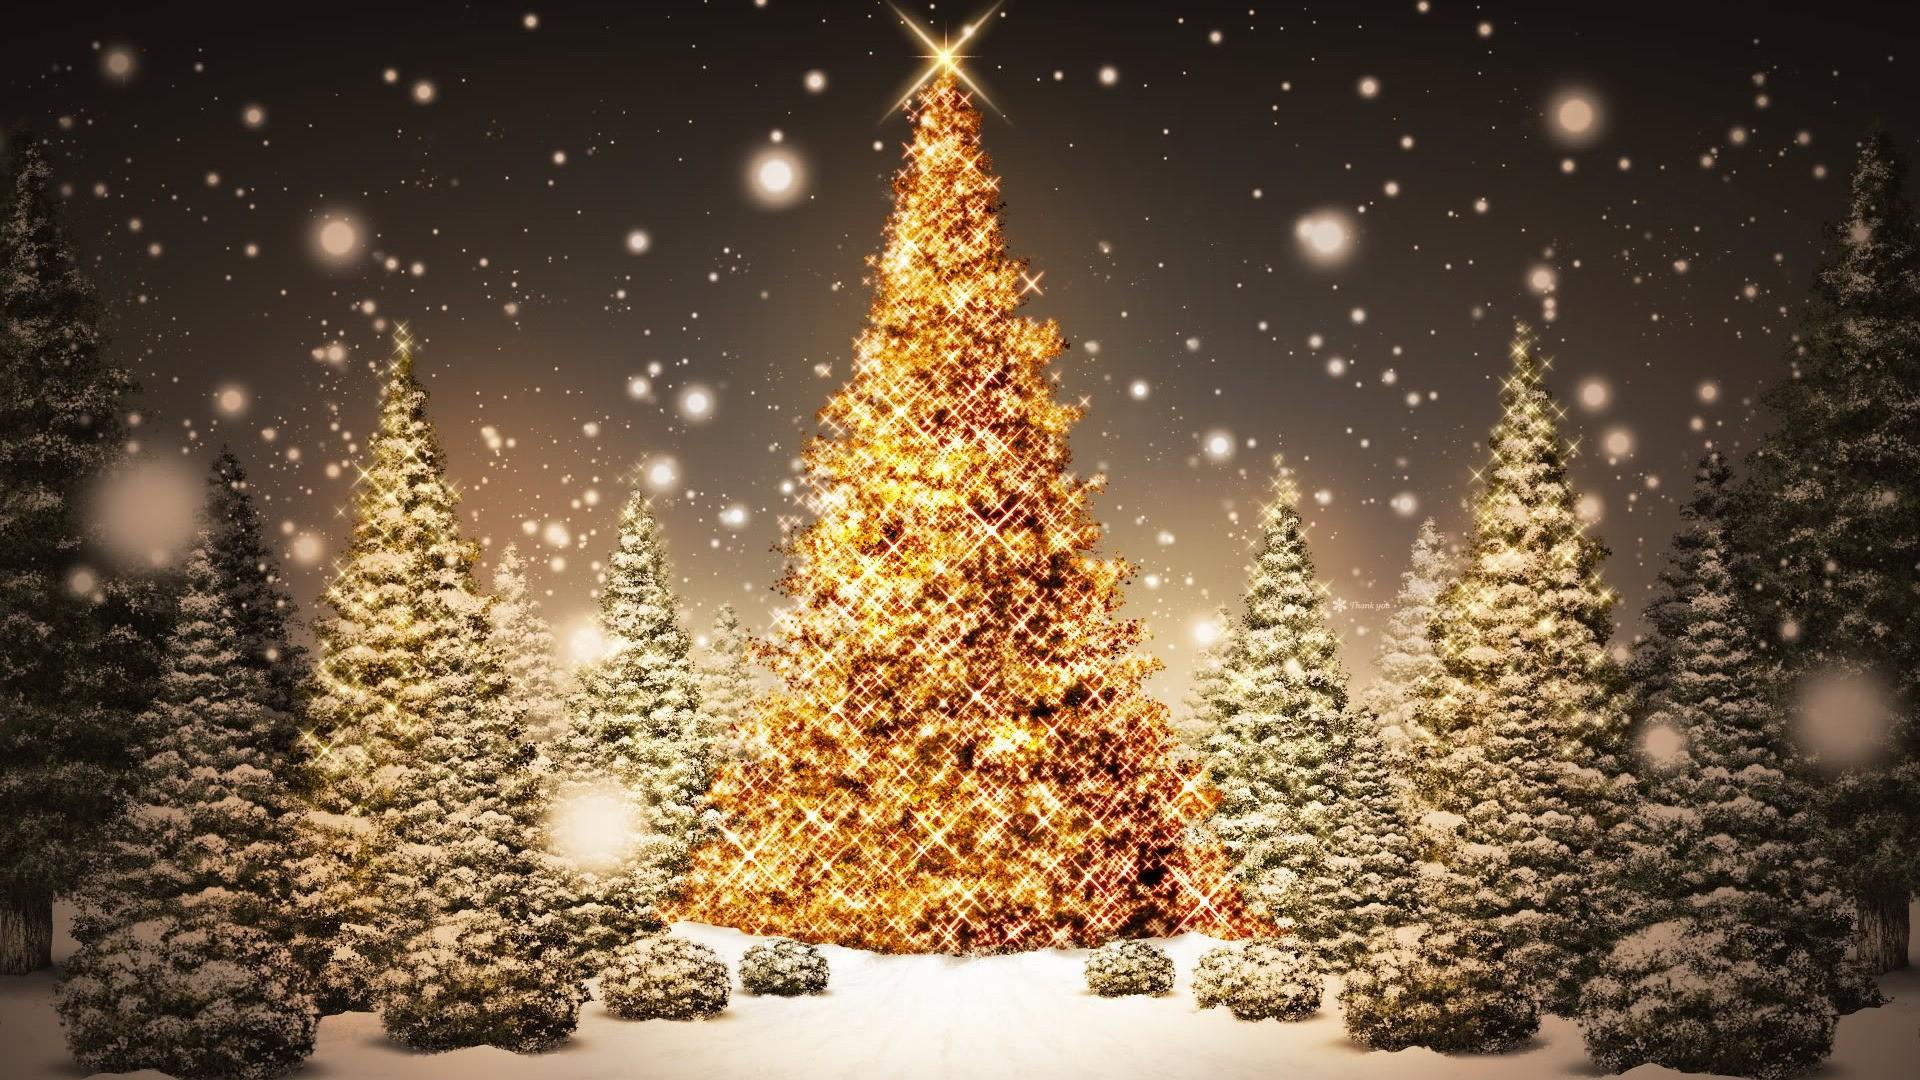 Christmas Lights Wallpapers And Screensavers 72 Images